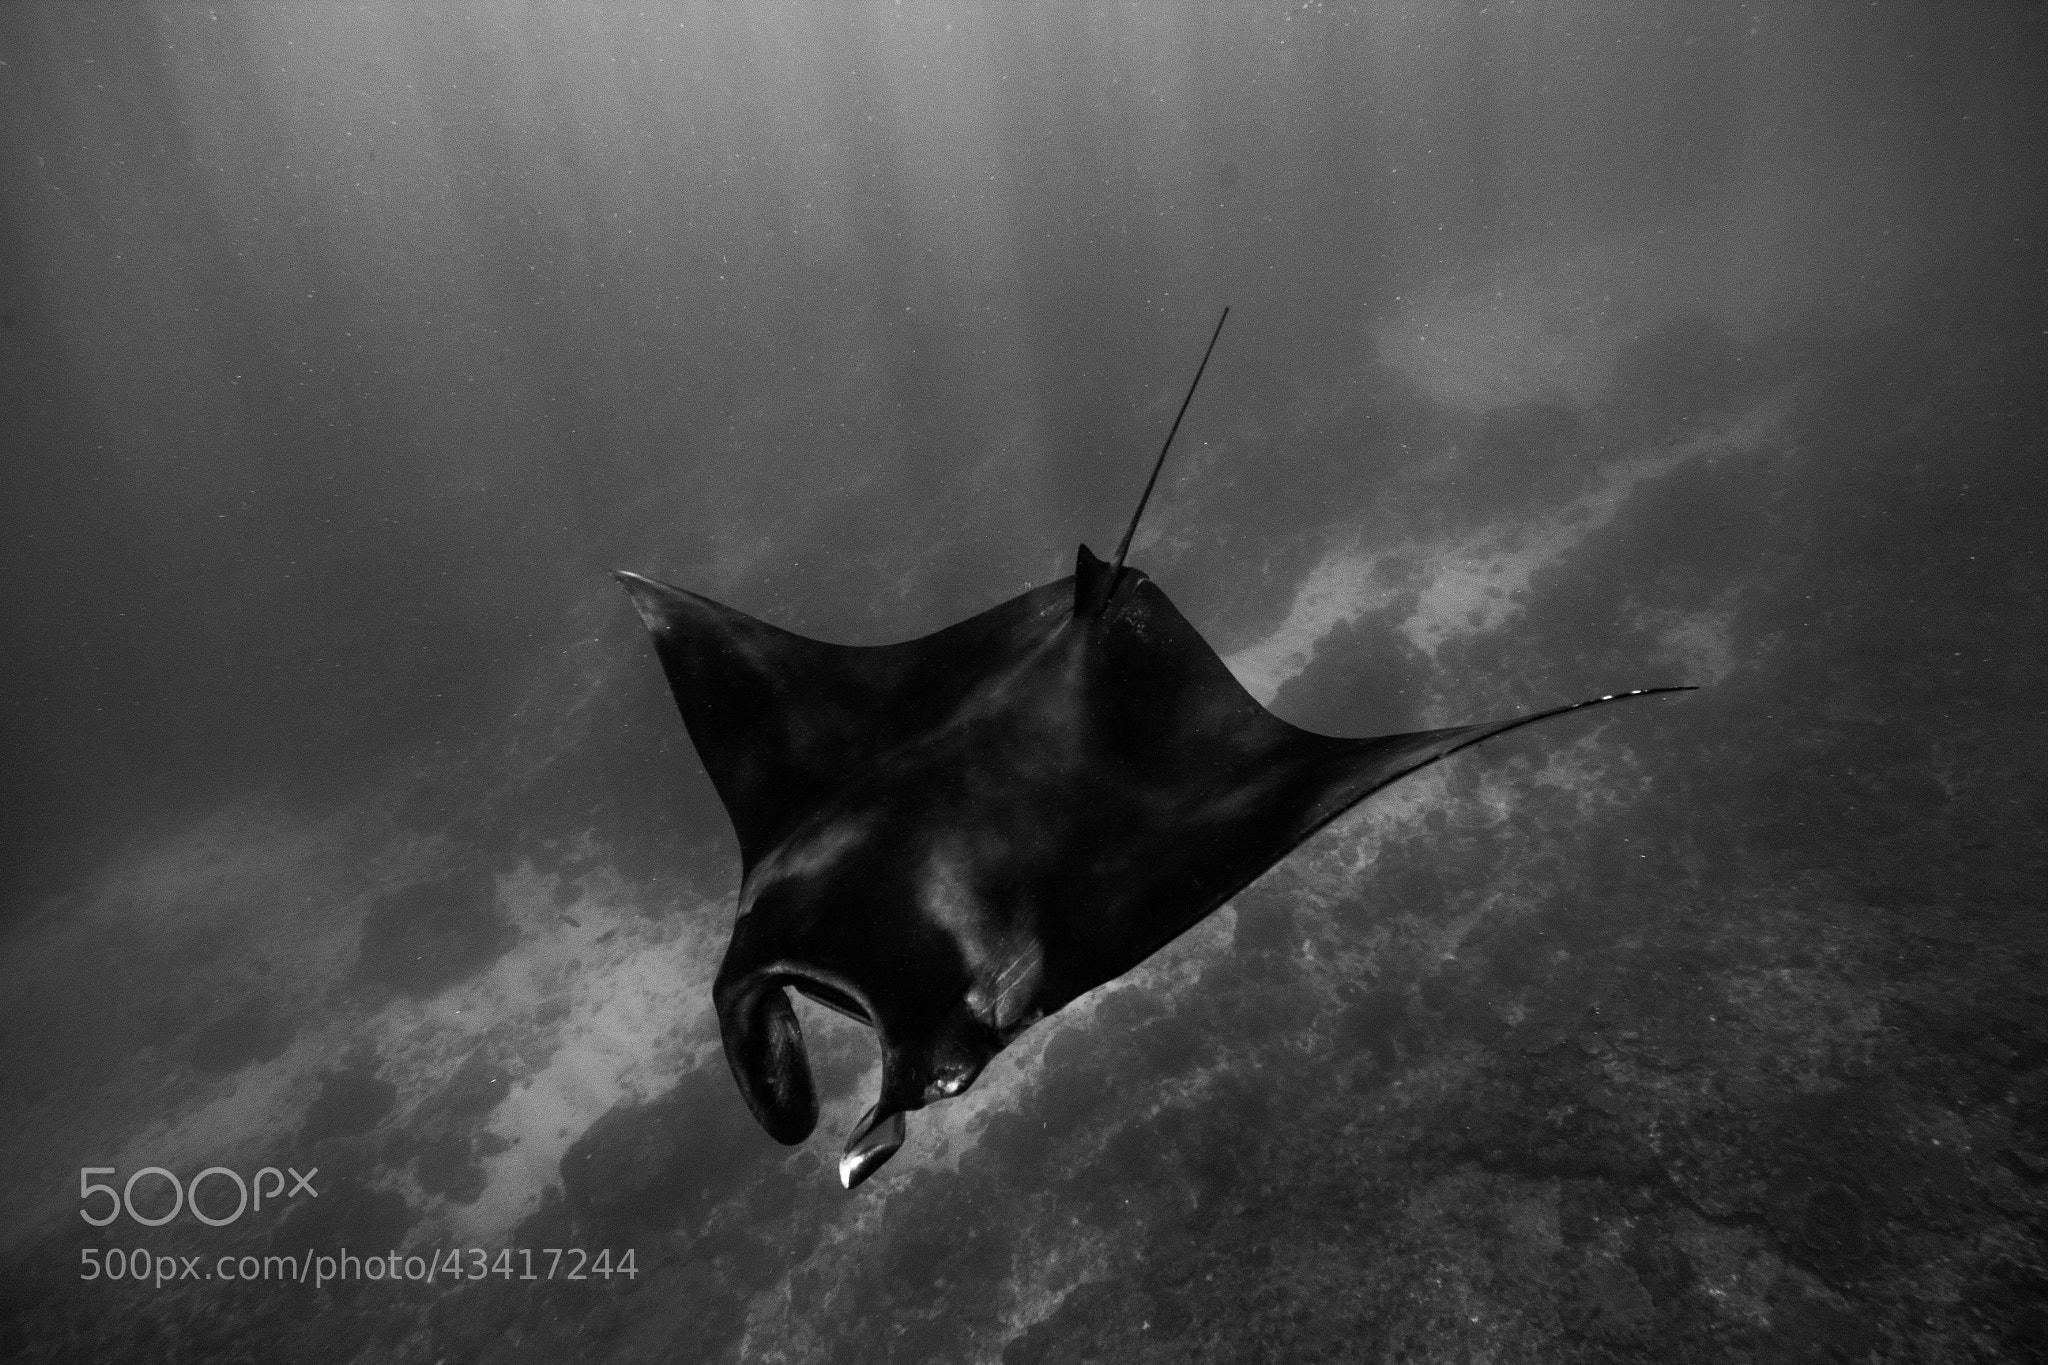 Photograph Glidin' by Gareth Neufeld on 500px